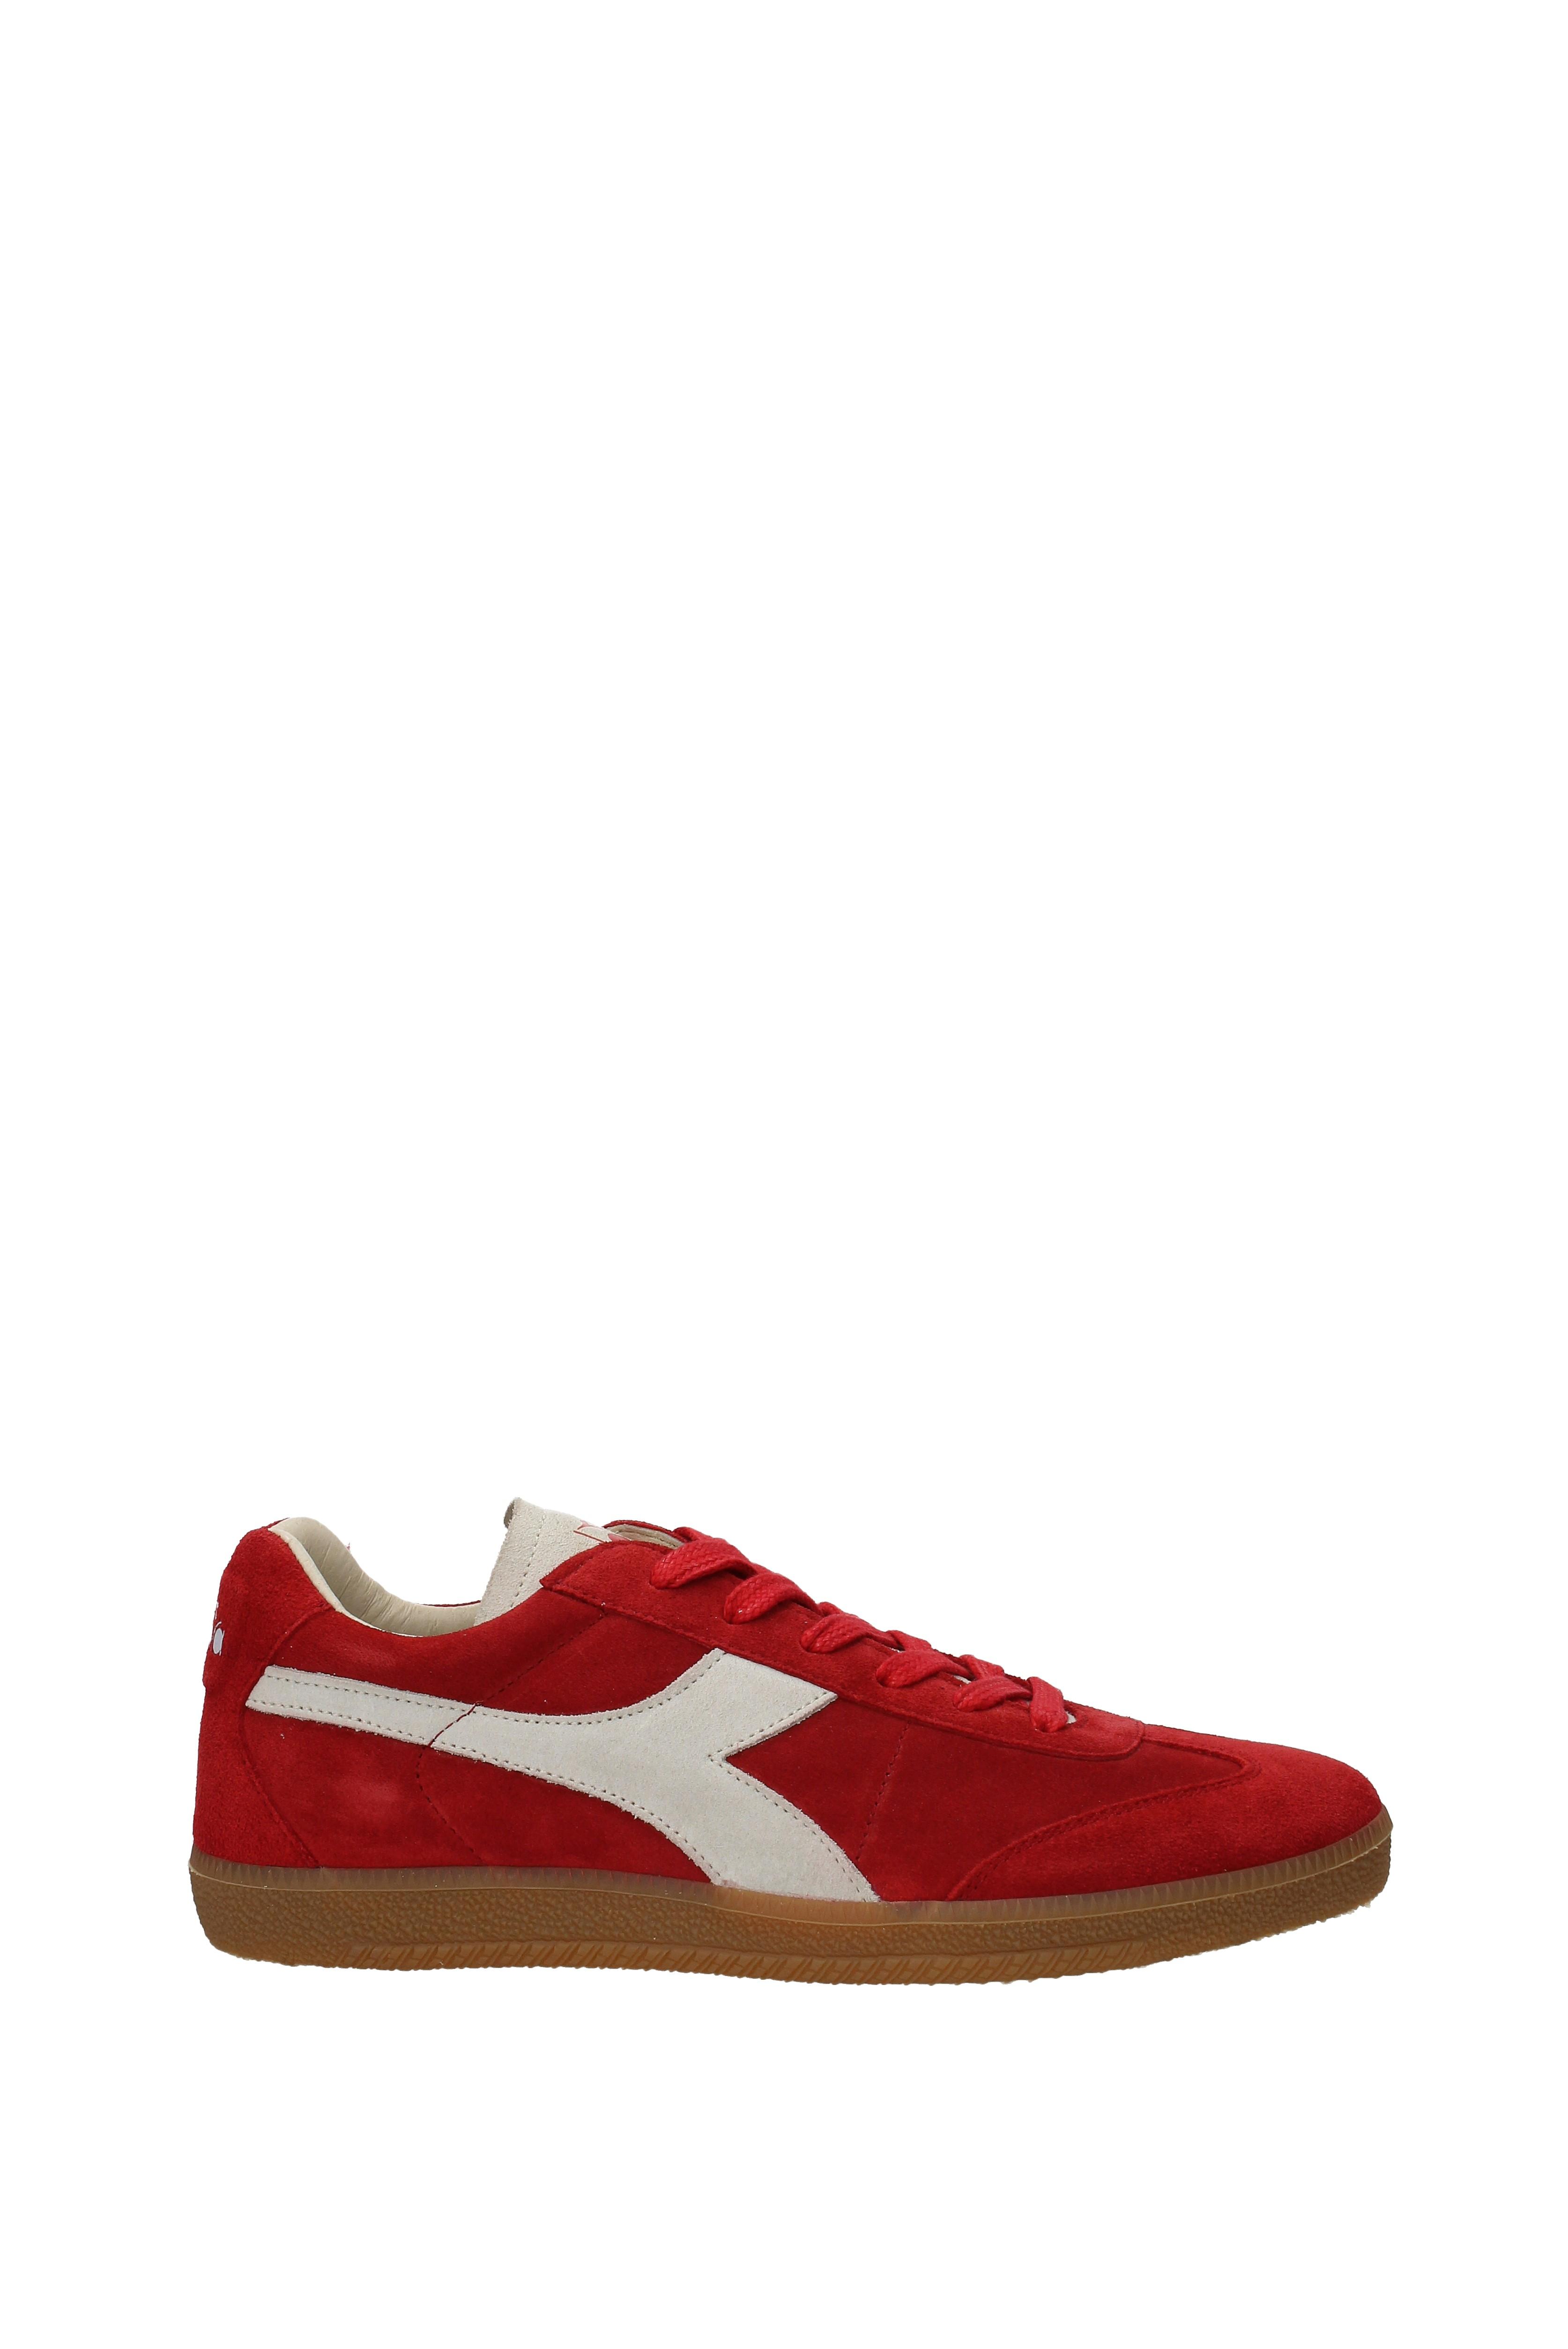 scarpe da ginnastica Diadora Heritage football Uomo - Camoscio Camoscio Camoscio (20117336501)   Facile Da Pulire Surface  607ca9